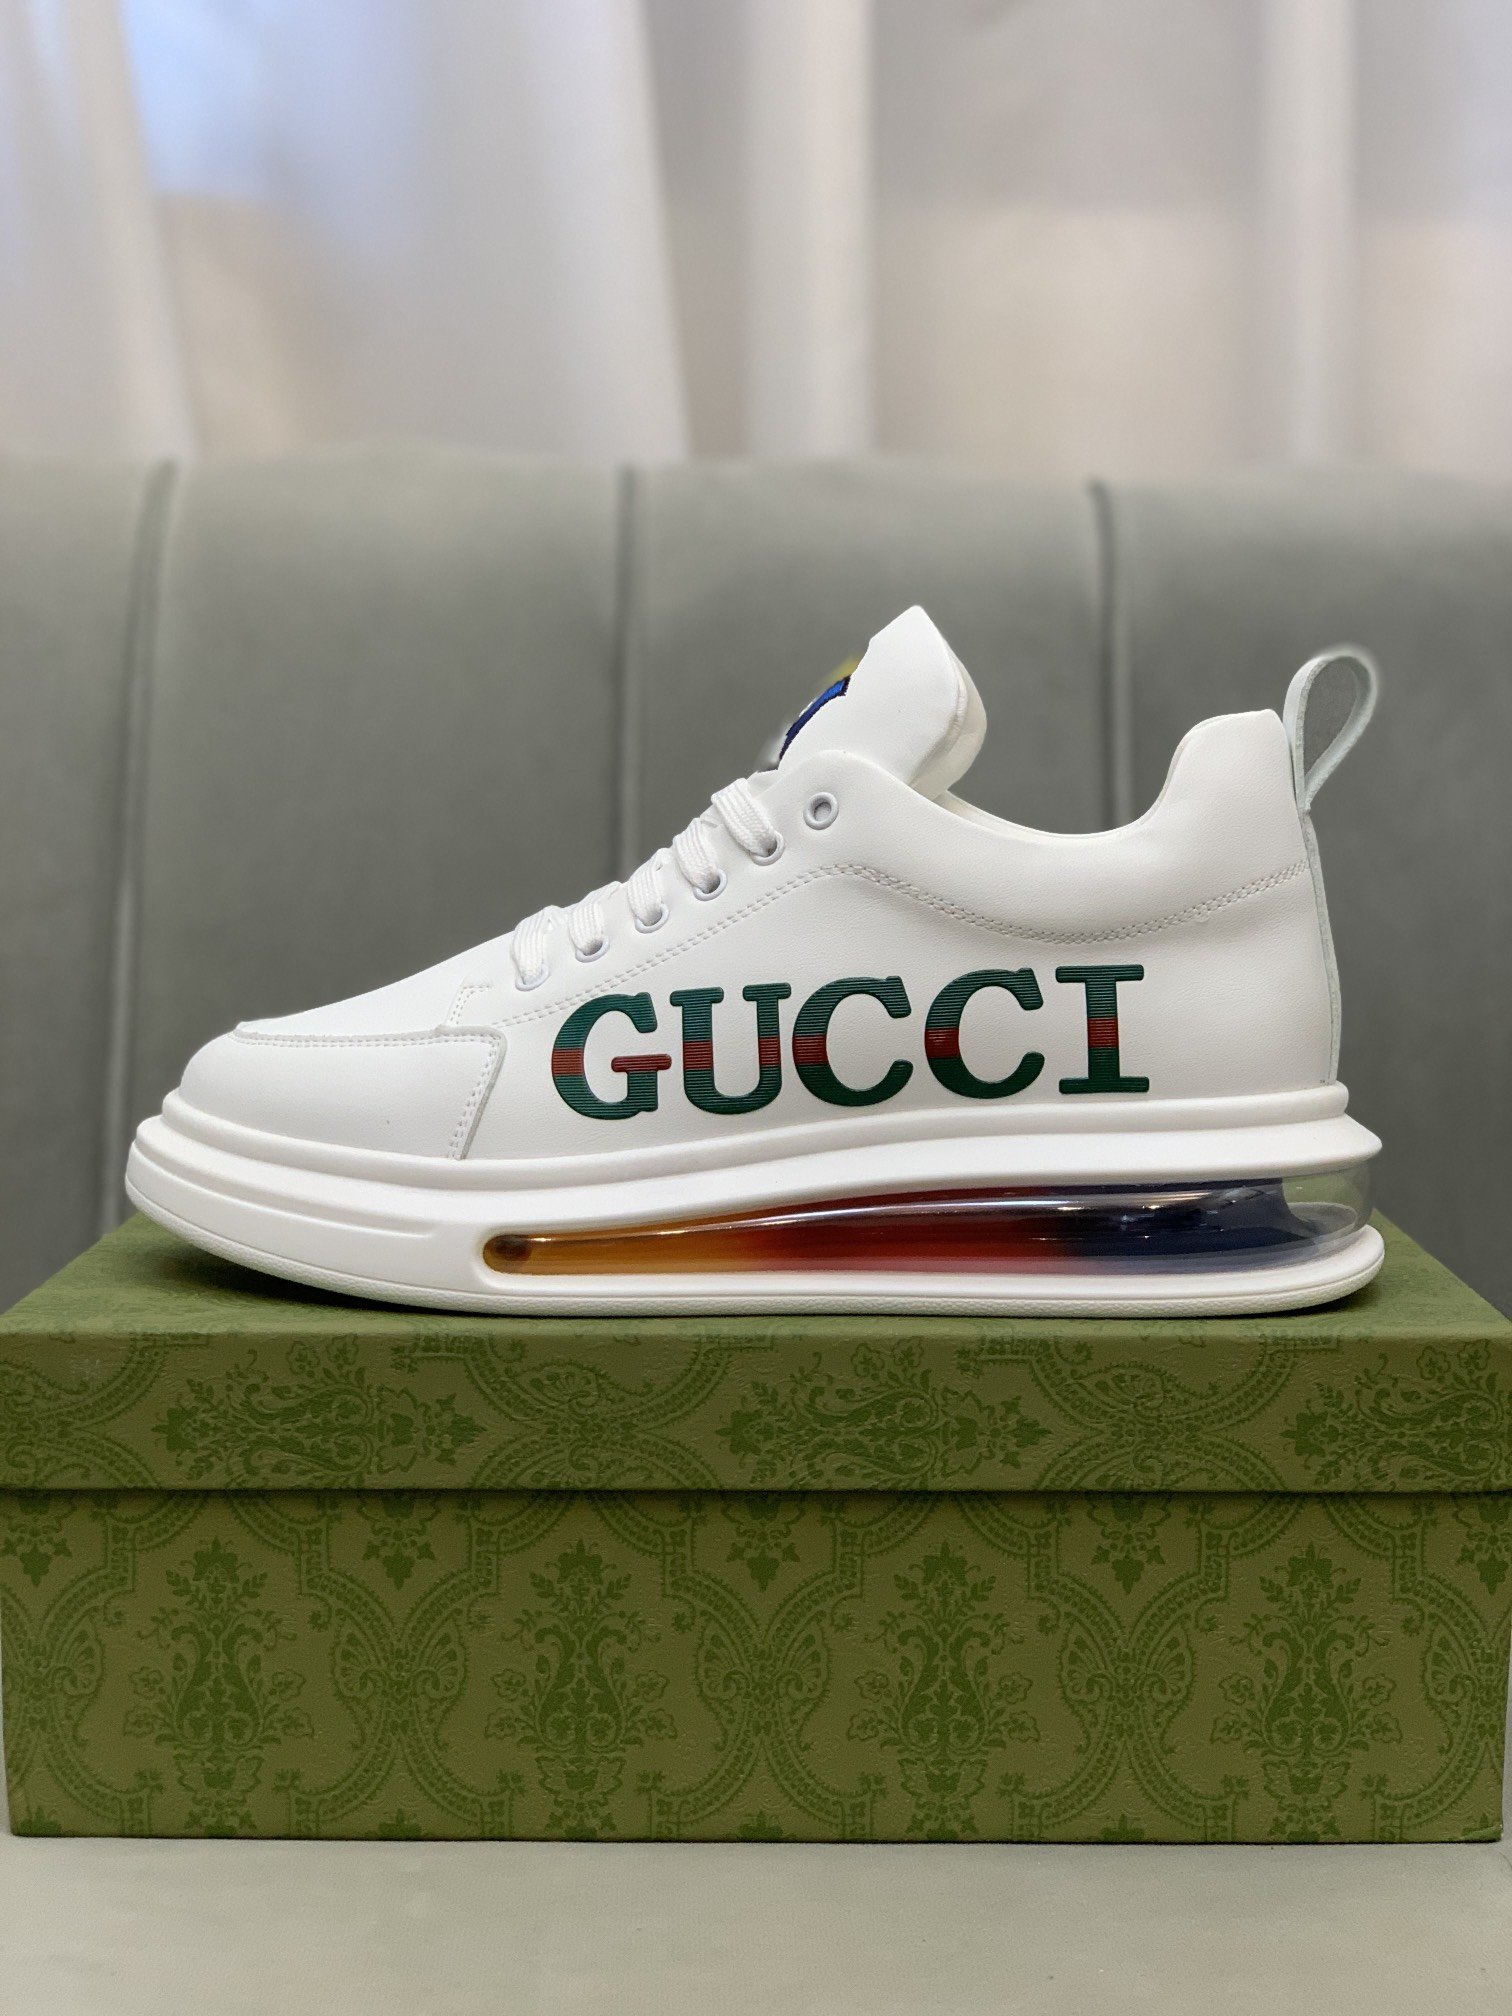 Gucc*古奇*低帮运动鞋正码码数: